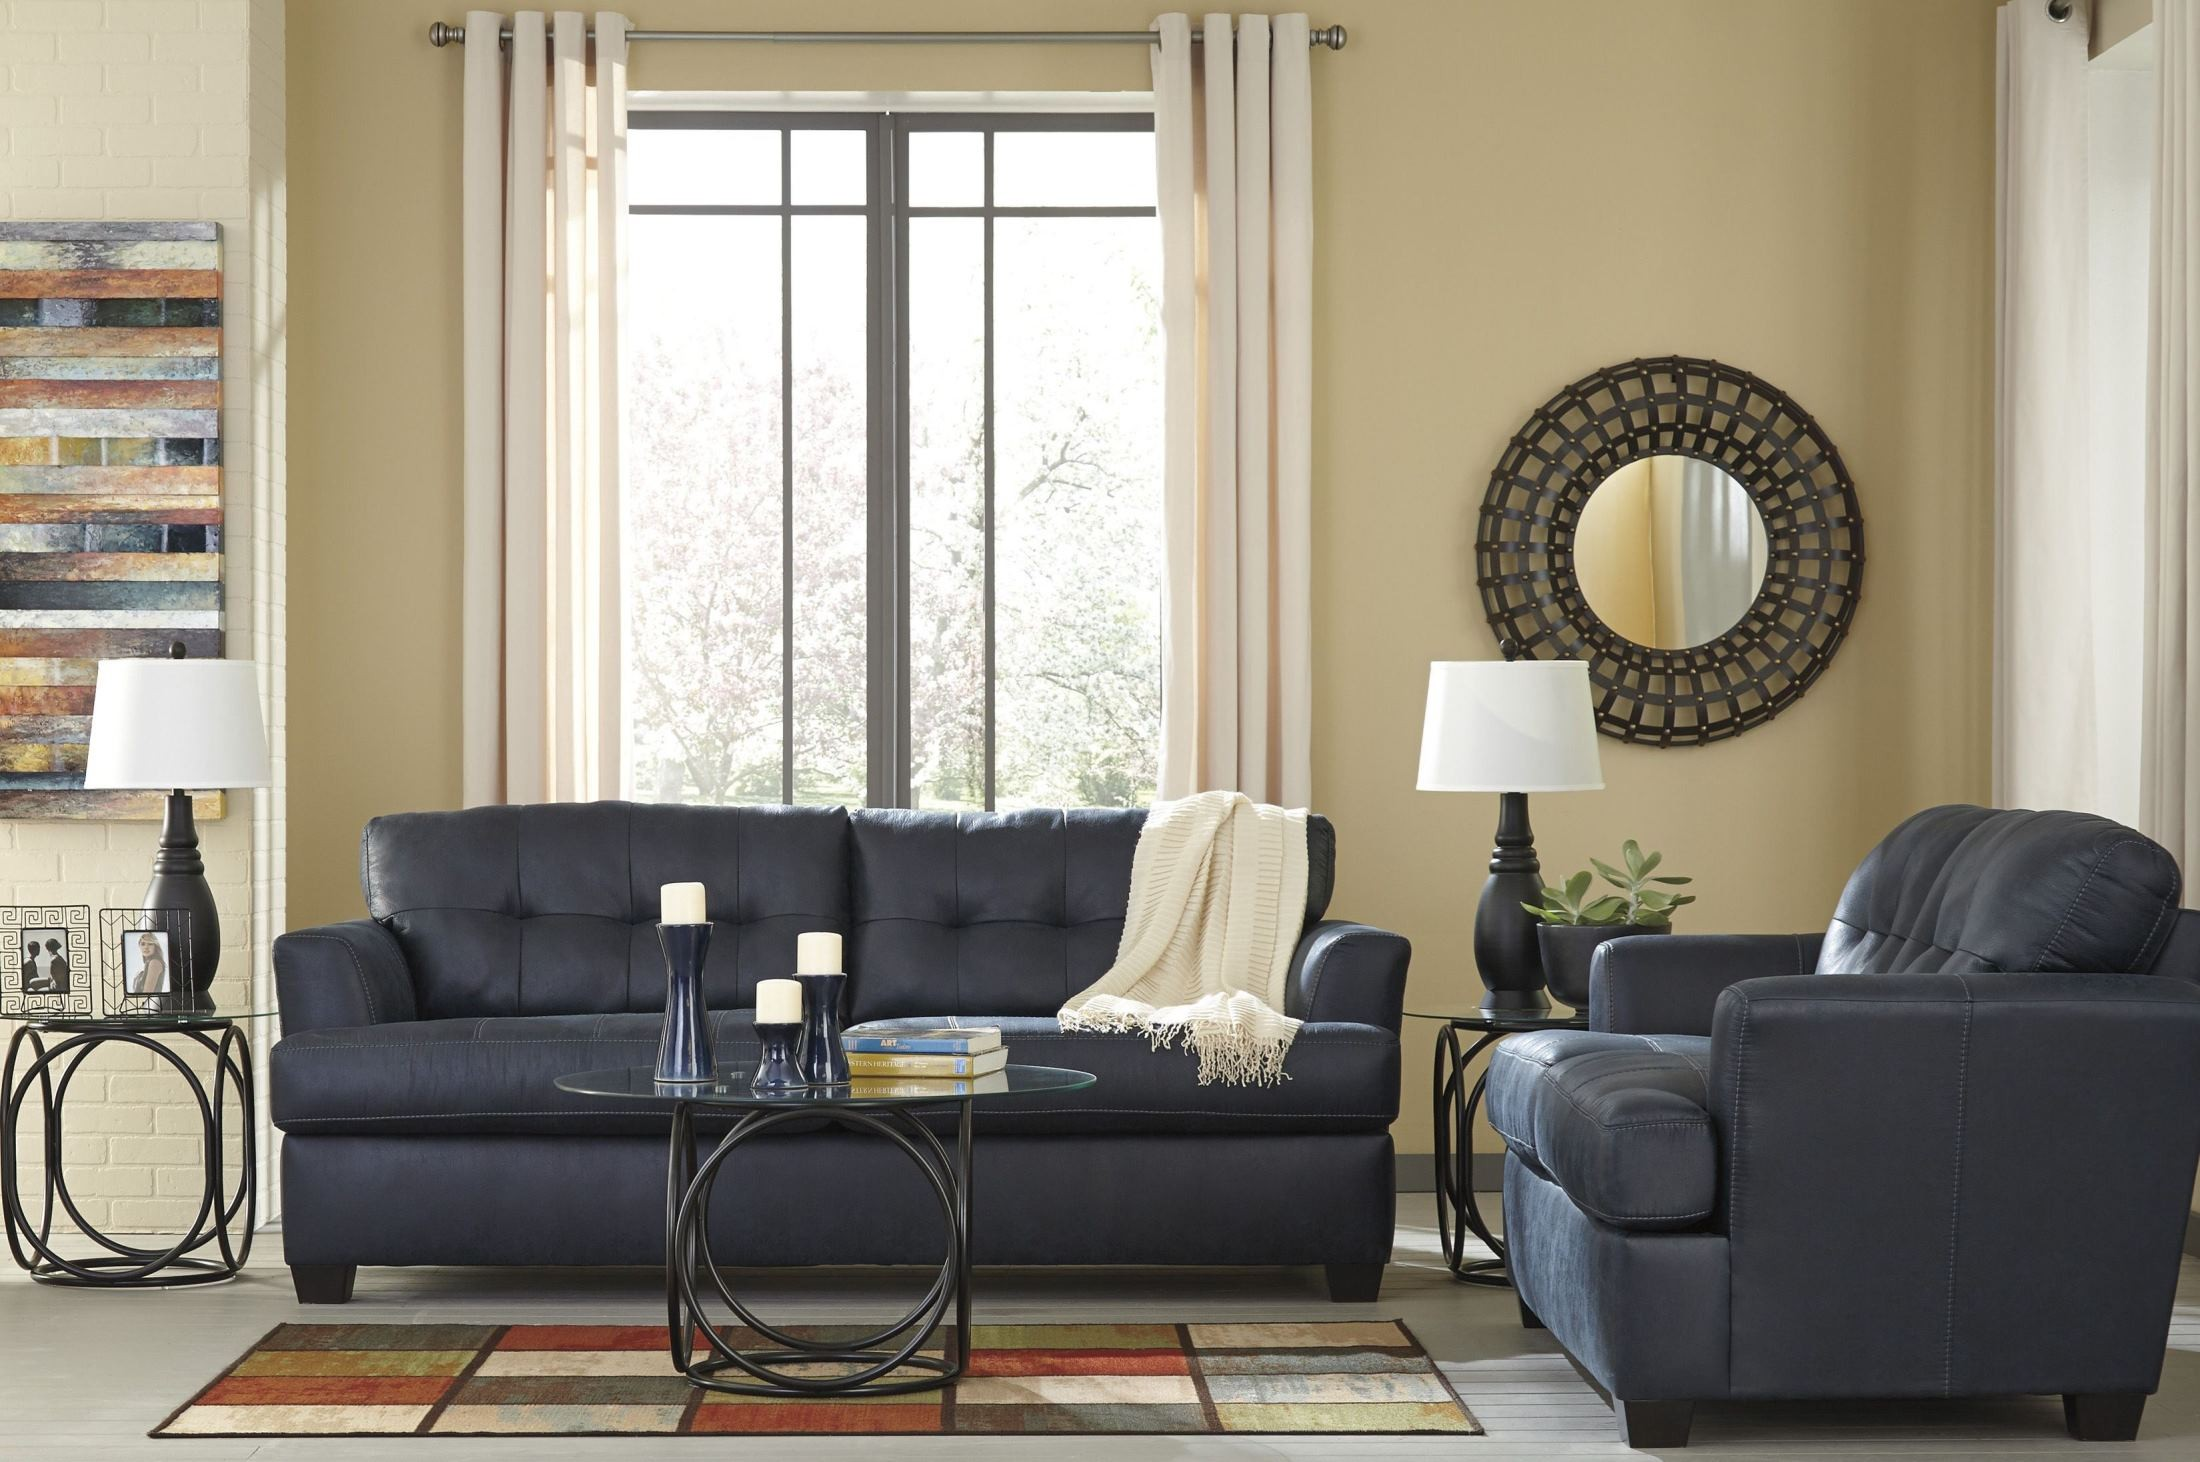 Inmon Navy Living Room Set 6580638 Ashley : 65806 38 35 t1161 from colemanfurniture.com size 2200 x 1462 jpeg 460kB